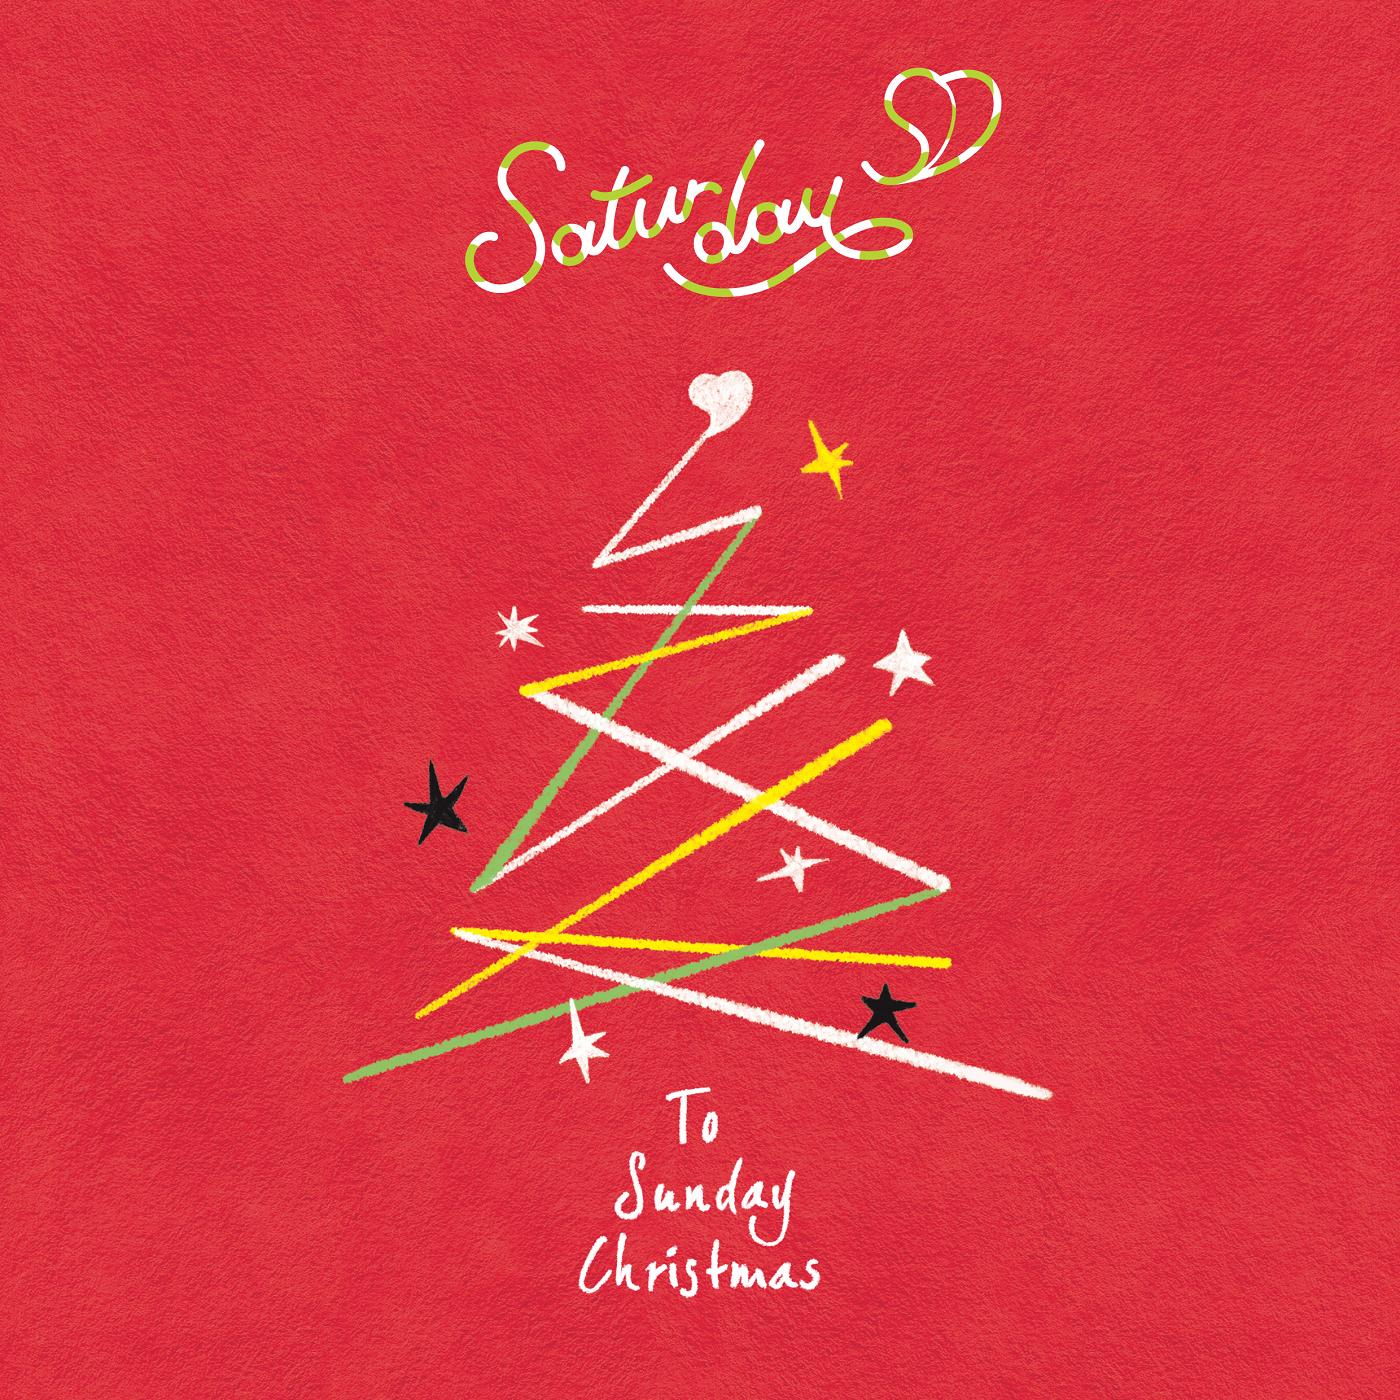 To Sunday Christmas